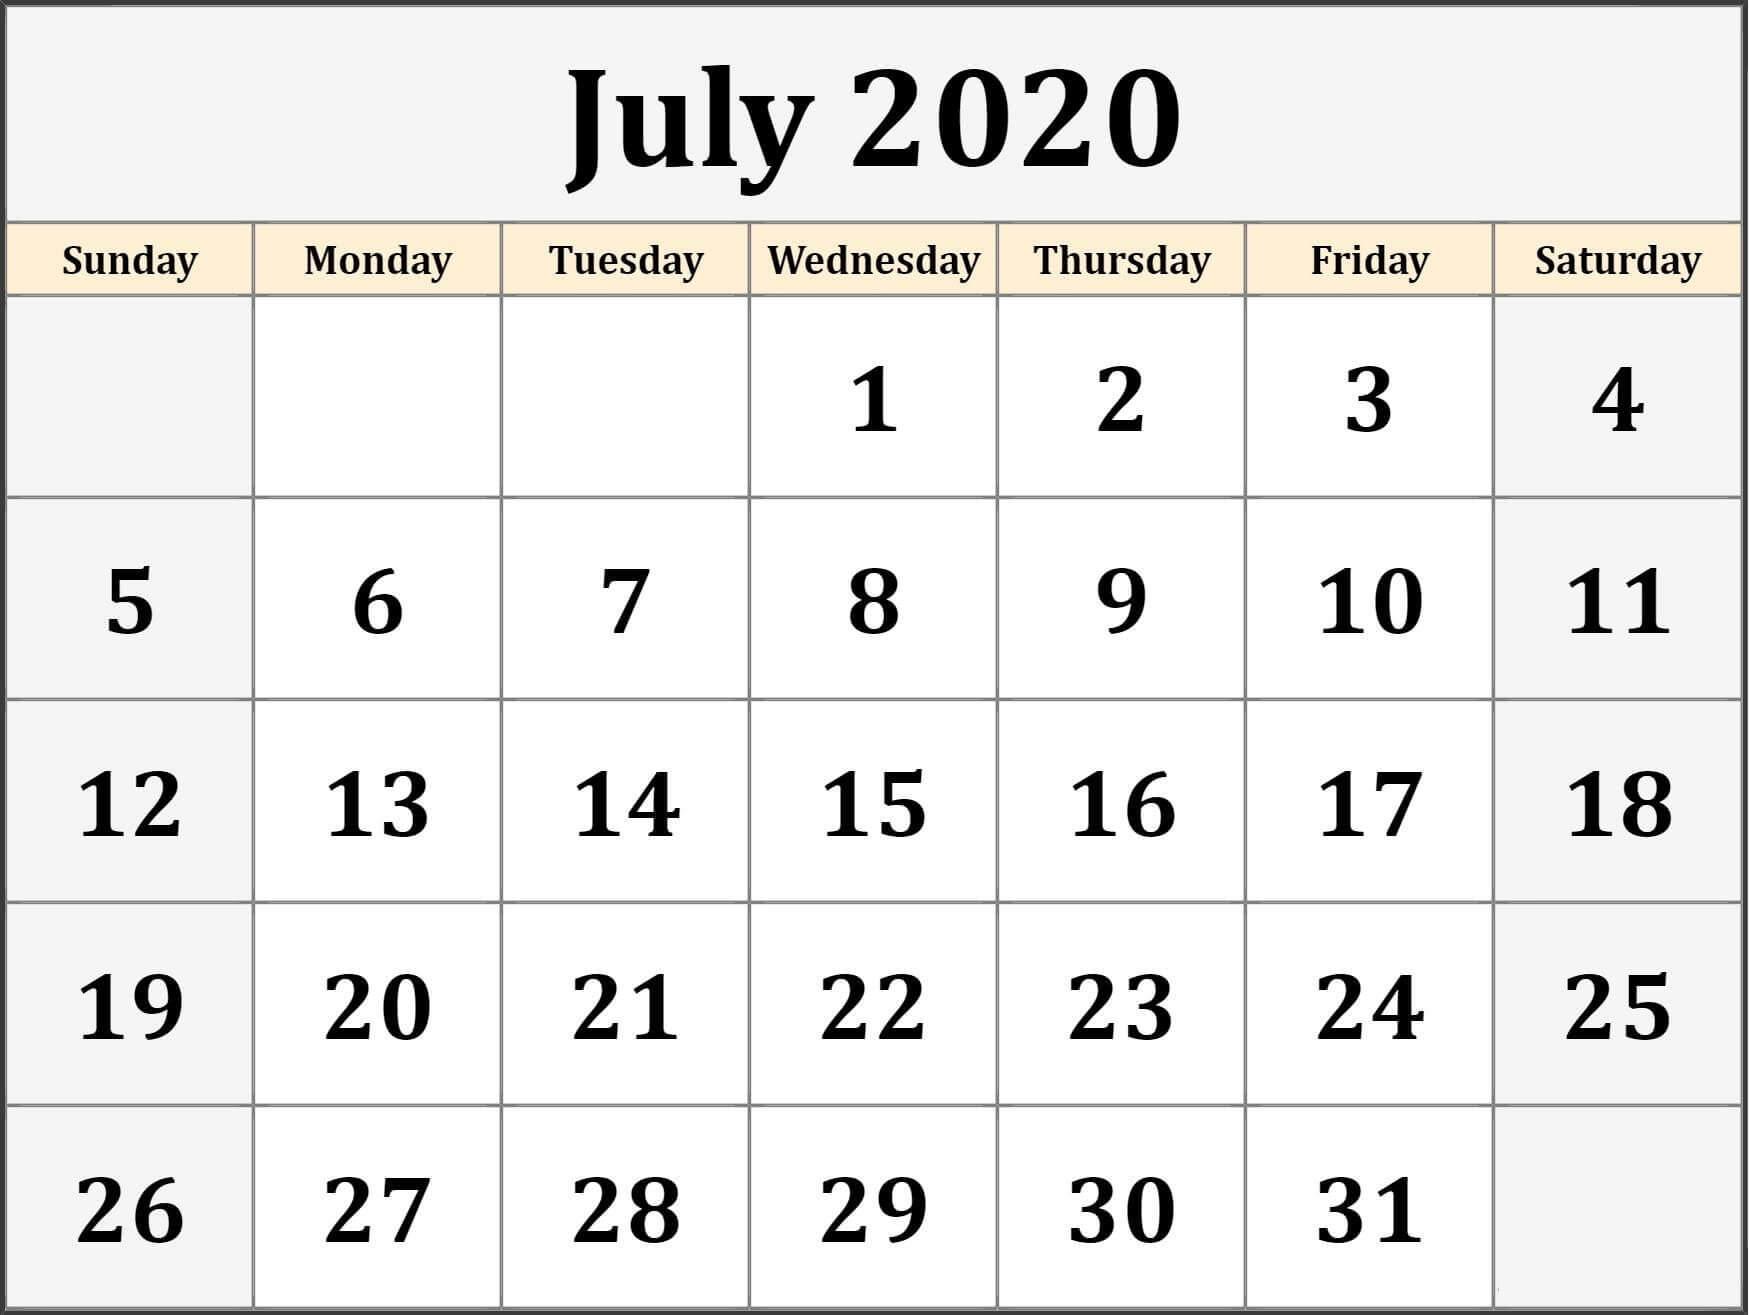 Calendar For July 2020 Template